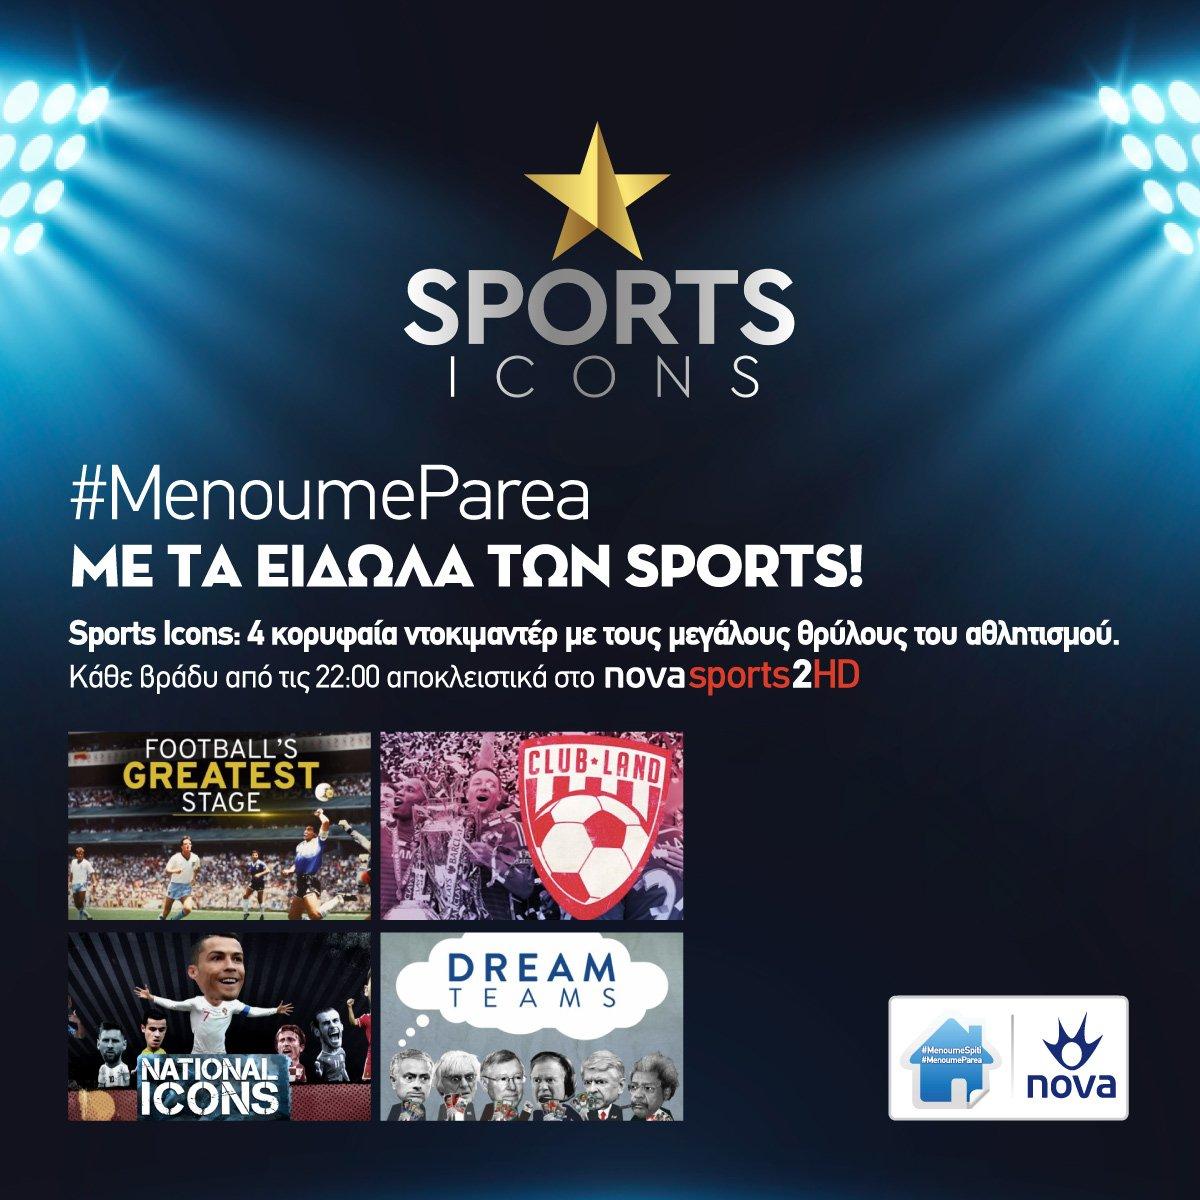 Novasports: «Μένουμε Παρέα» με ελληνικά ντέρμπι, Sports Icons και σπέσιαλ αφιερώματα σε Wimbledon και EuroCup!